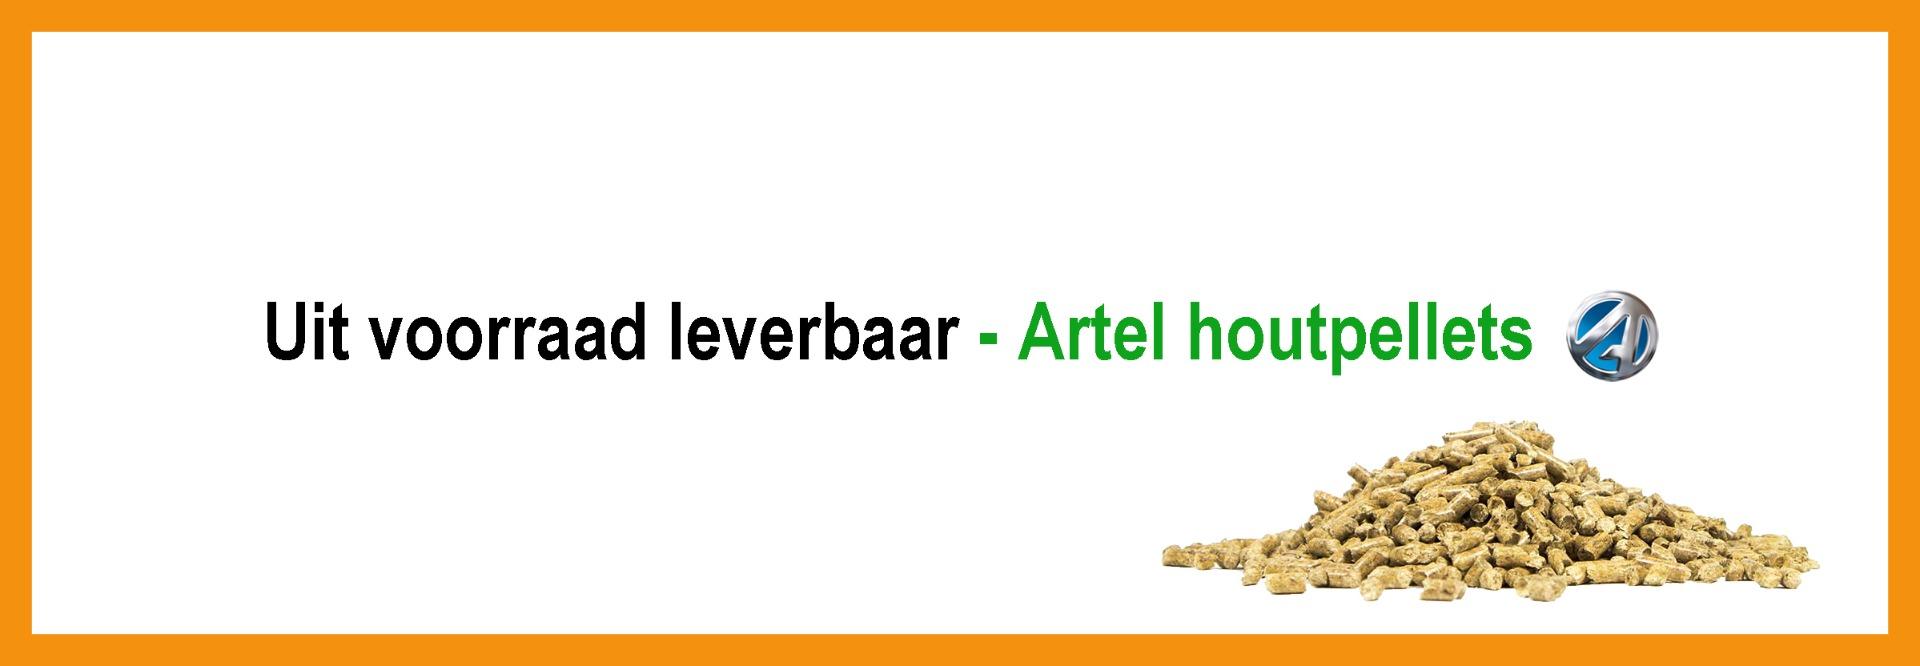 Artel houtpellets